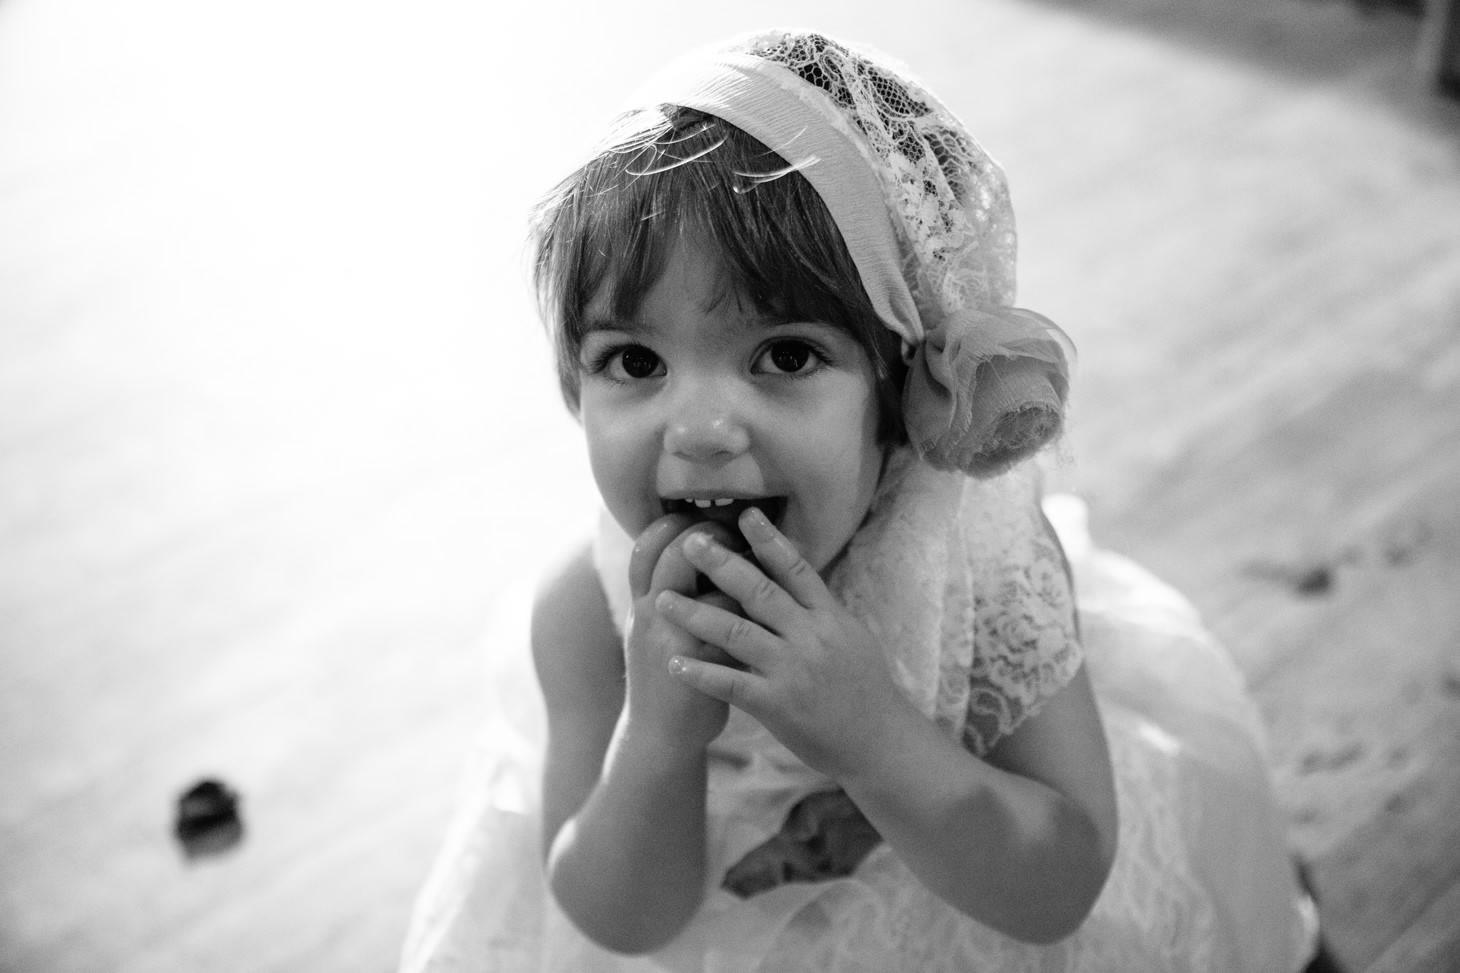 024-nyc-dumbo-loft-brooklyn-wedding-photographer-smitten-chickens-photo-.jpg